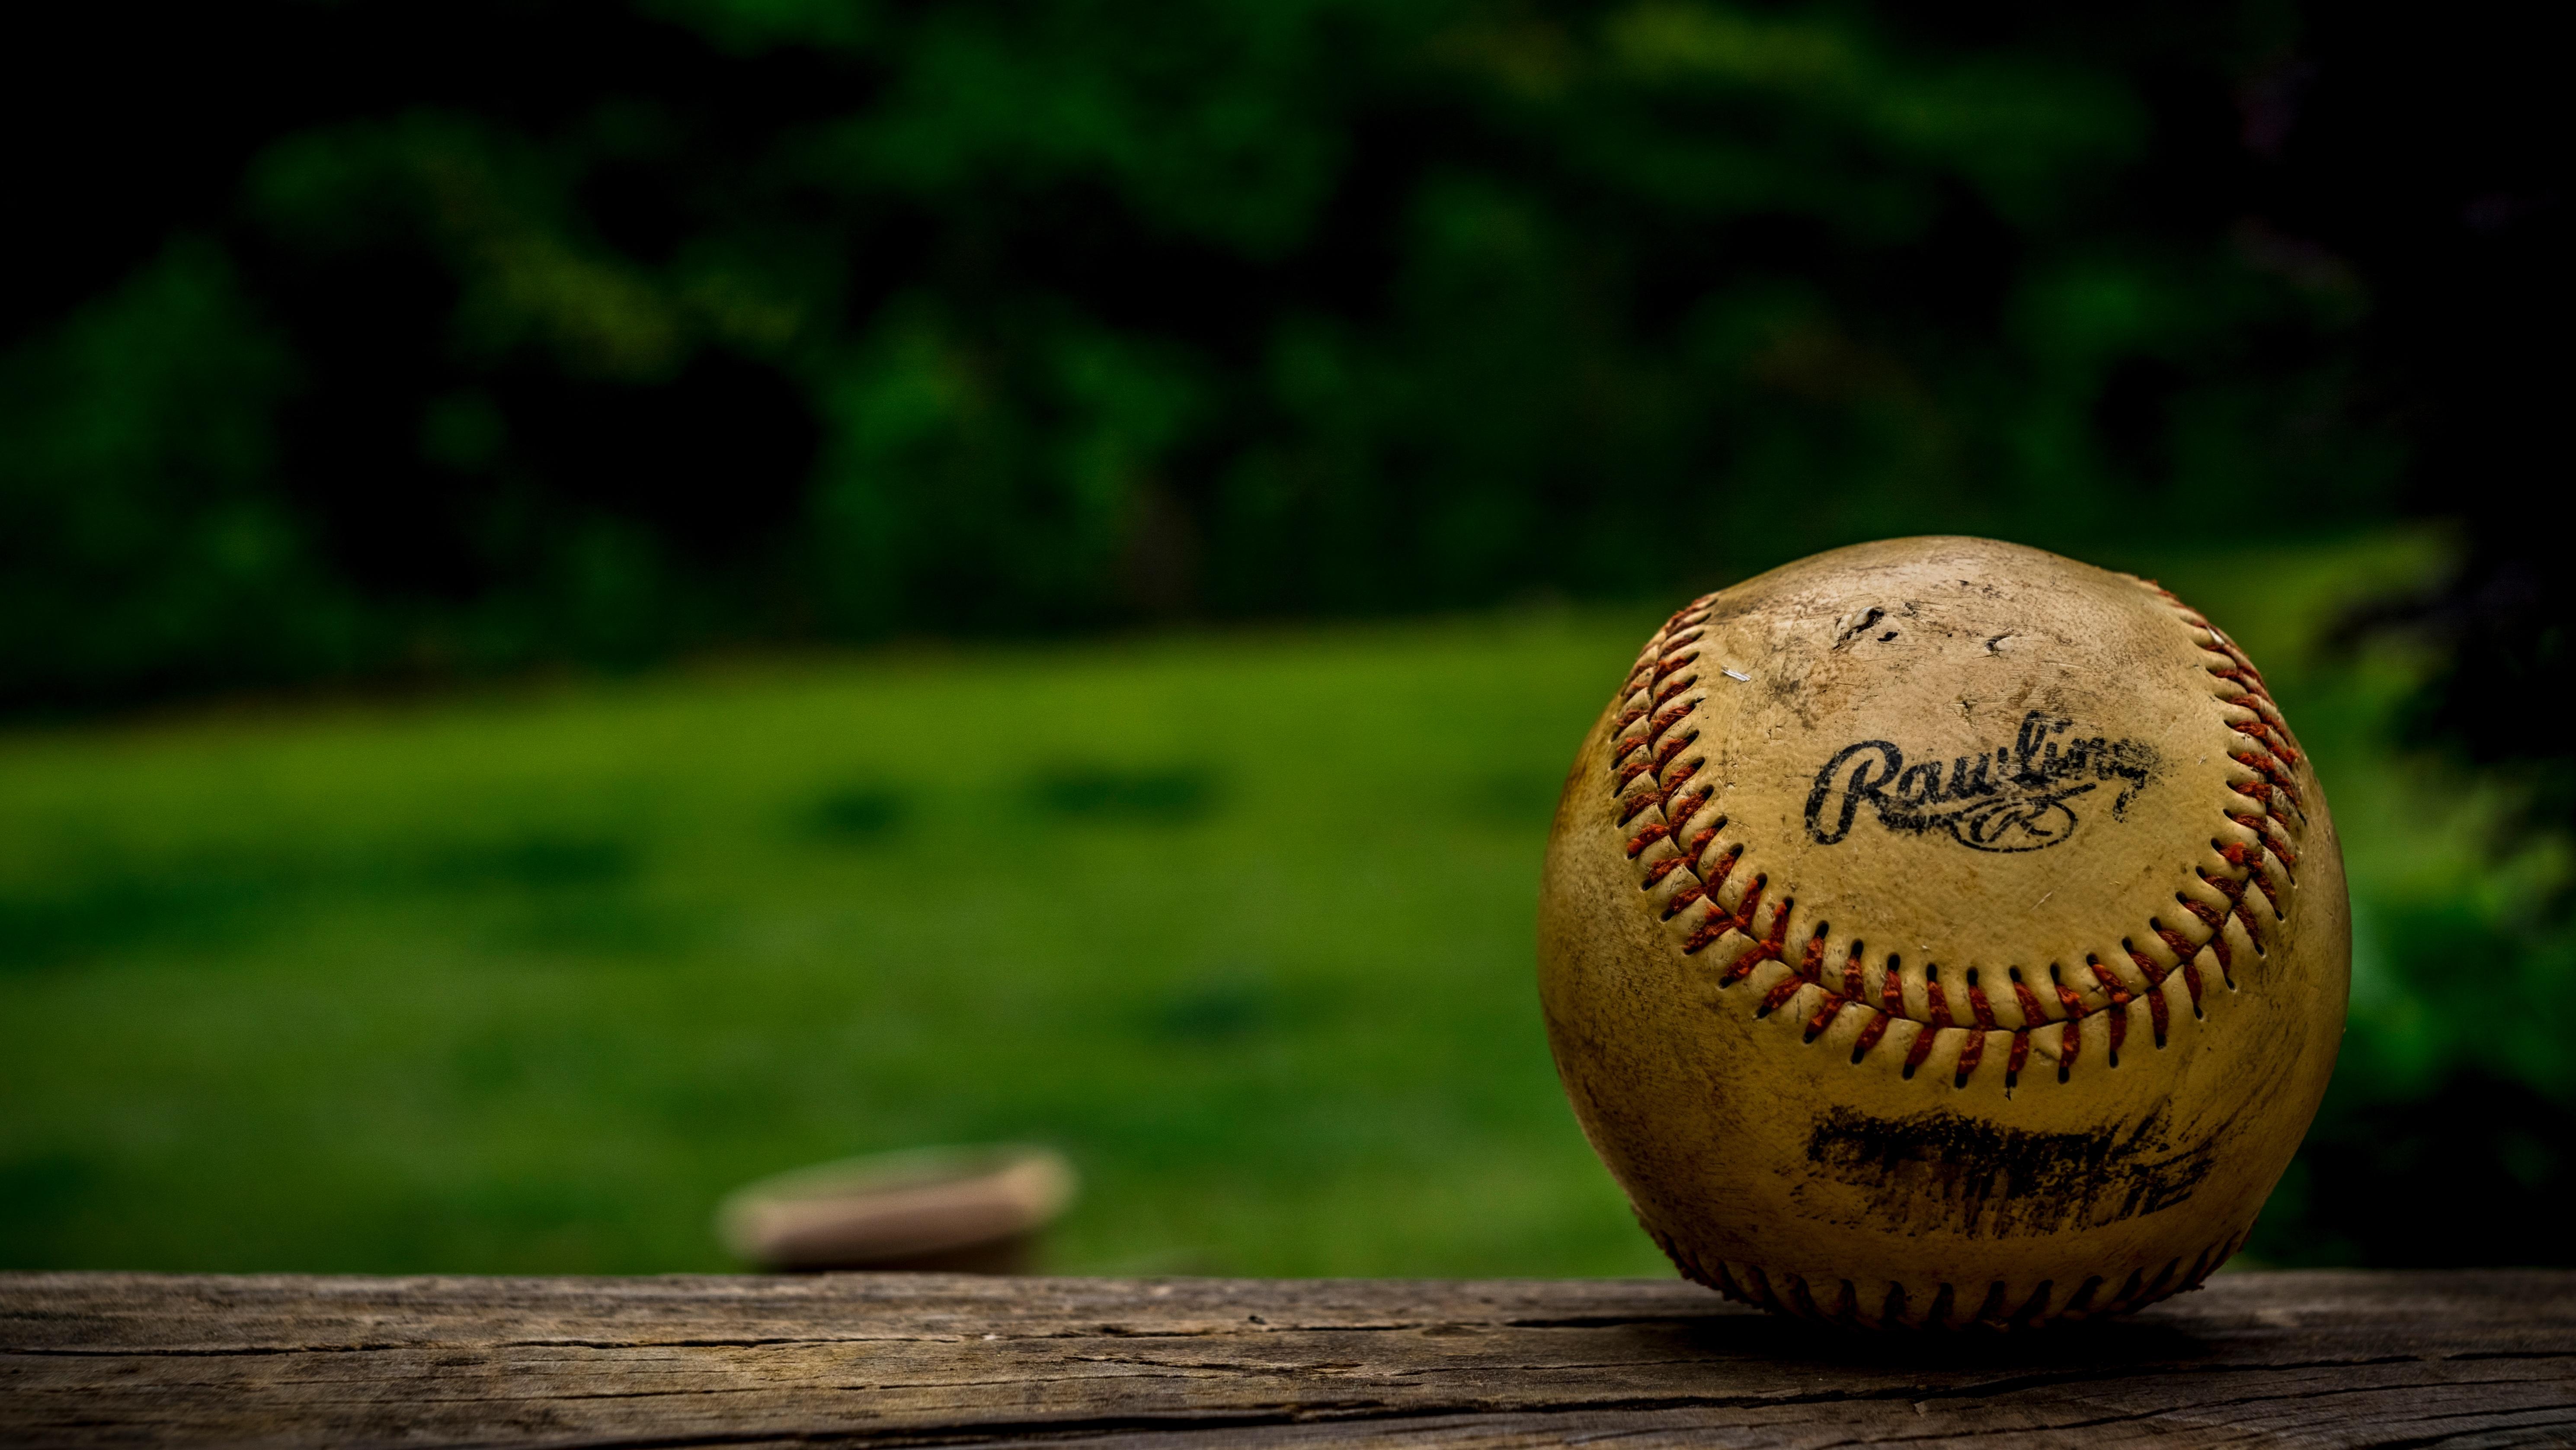 Baseball, Prayer, Lent and Practice